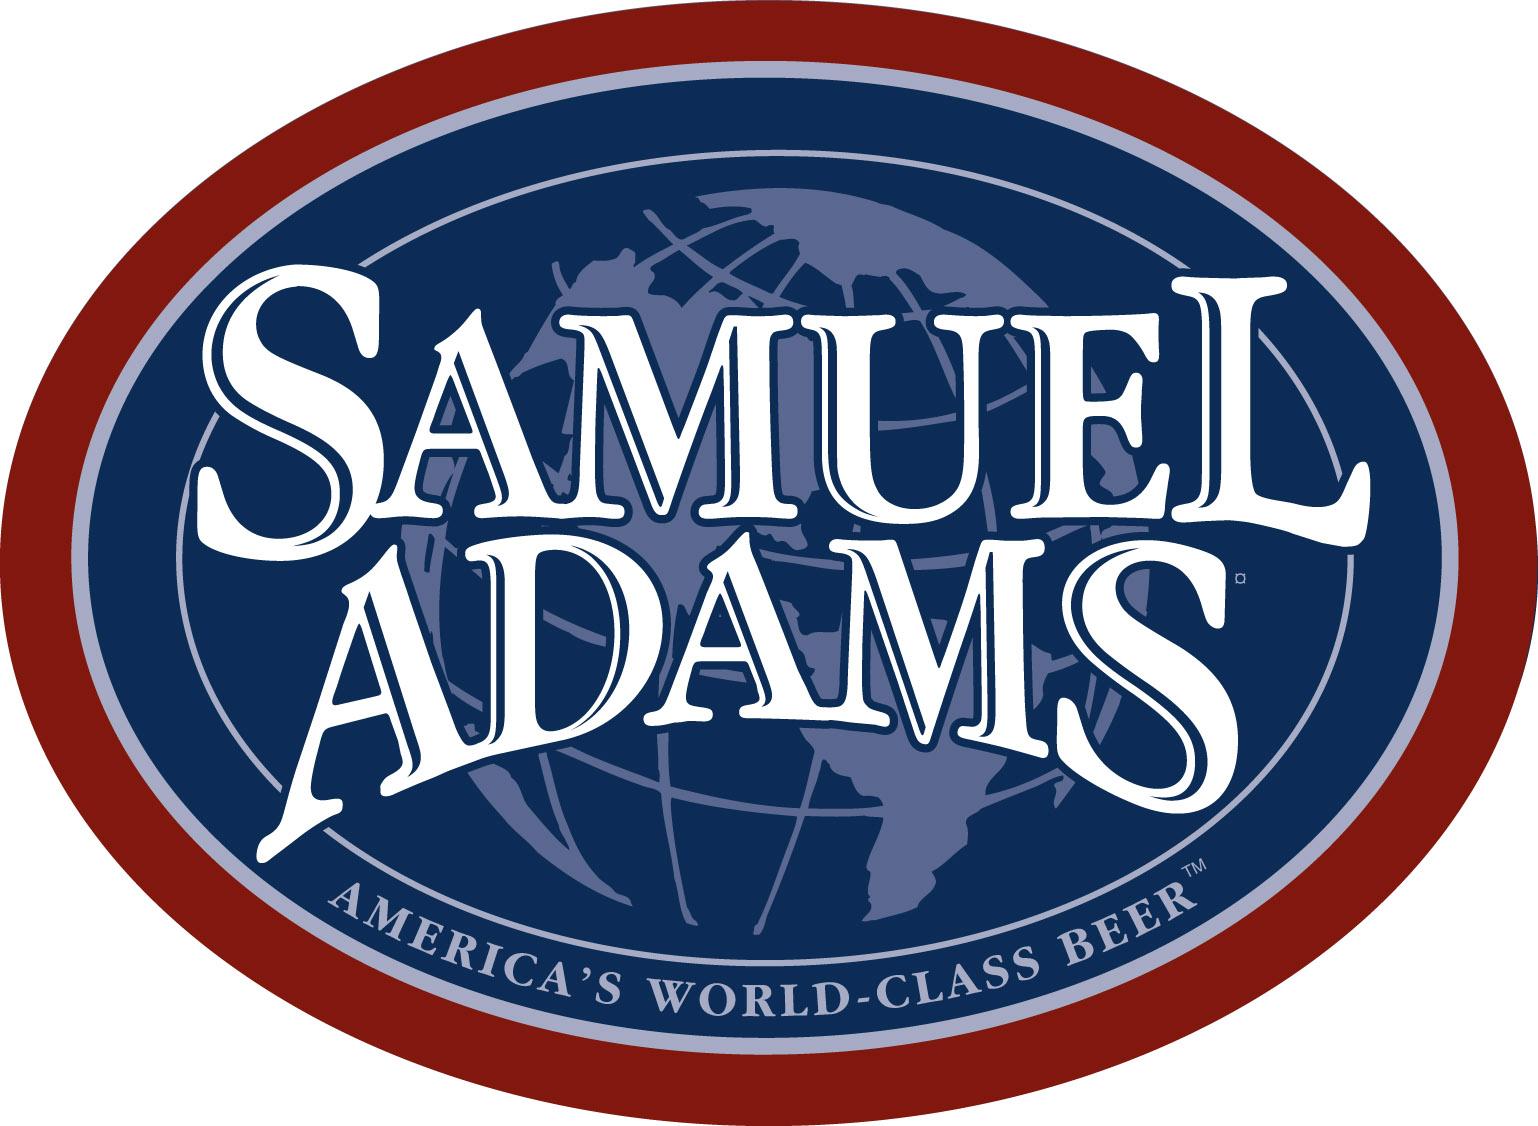 Boston Beer Company (Samuel Adams)